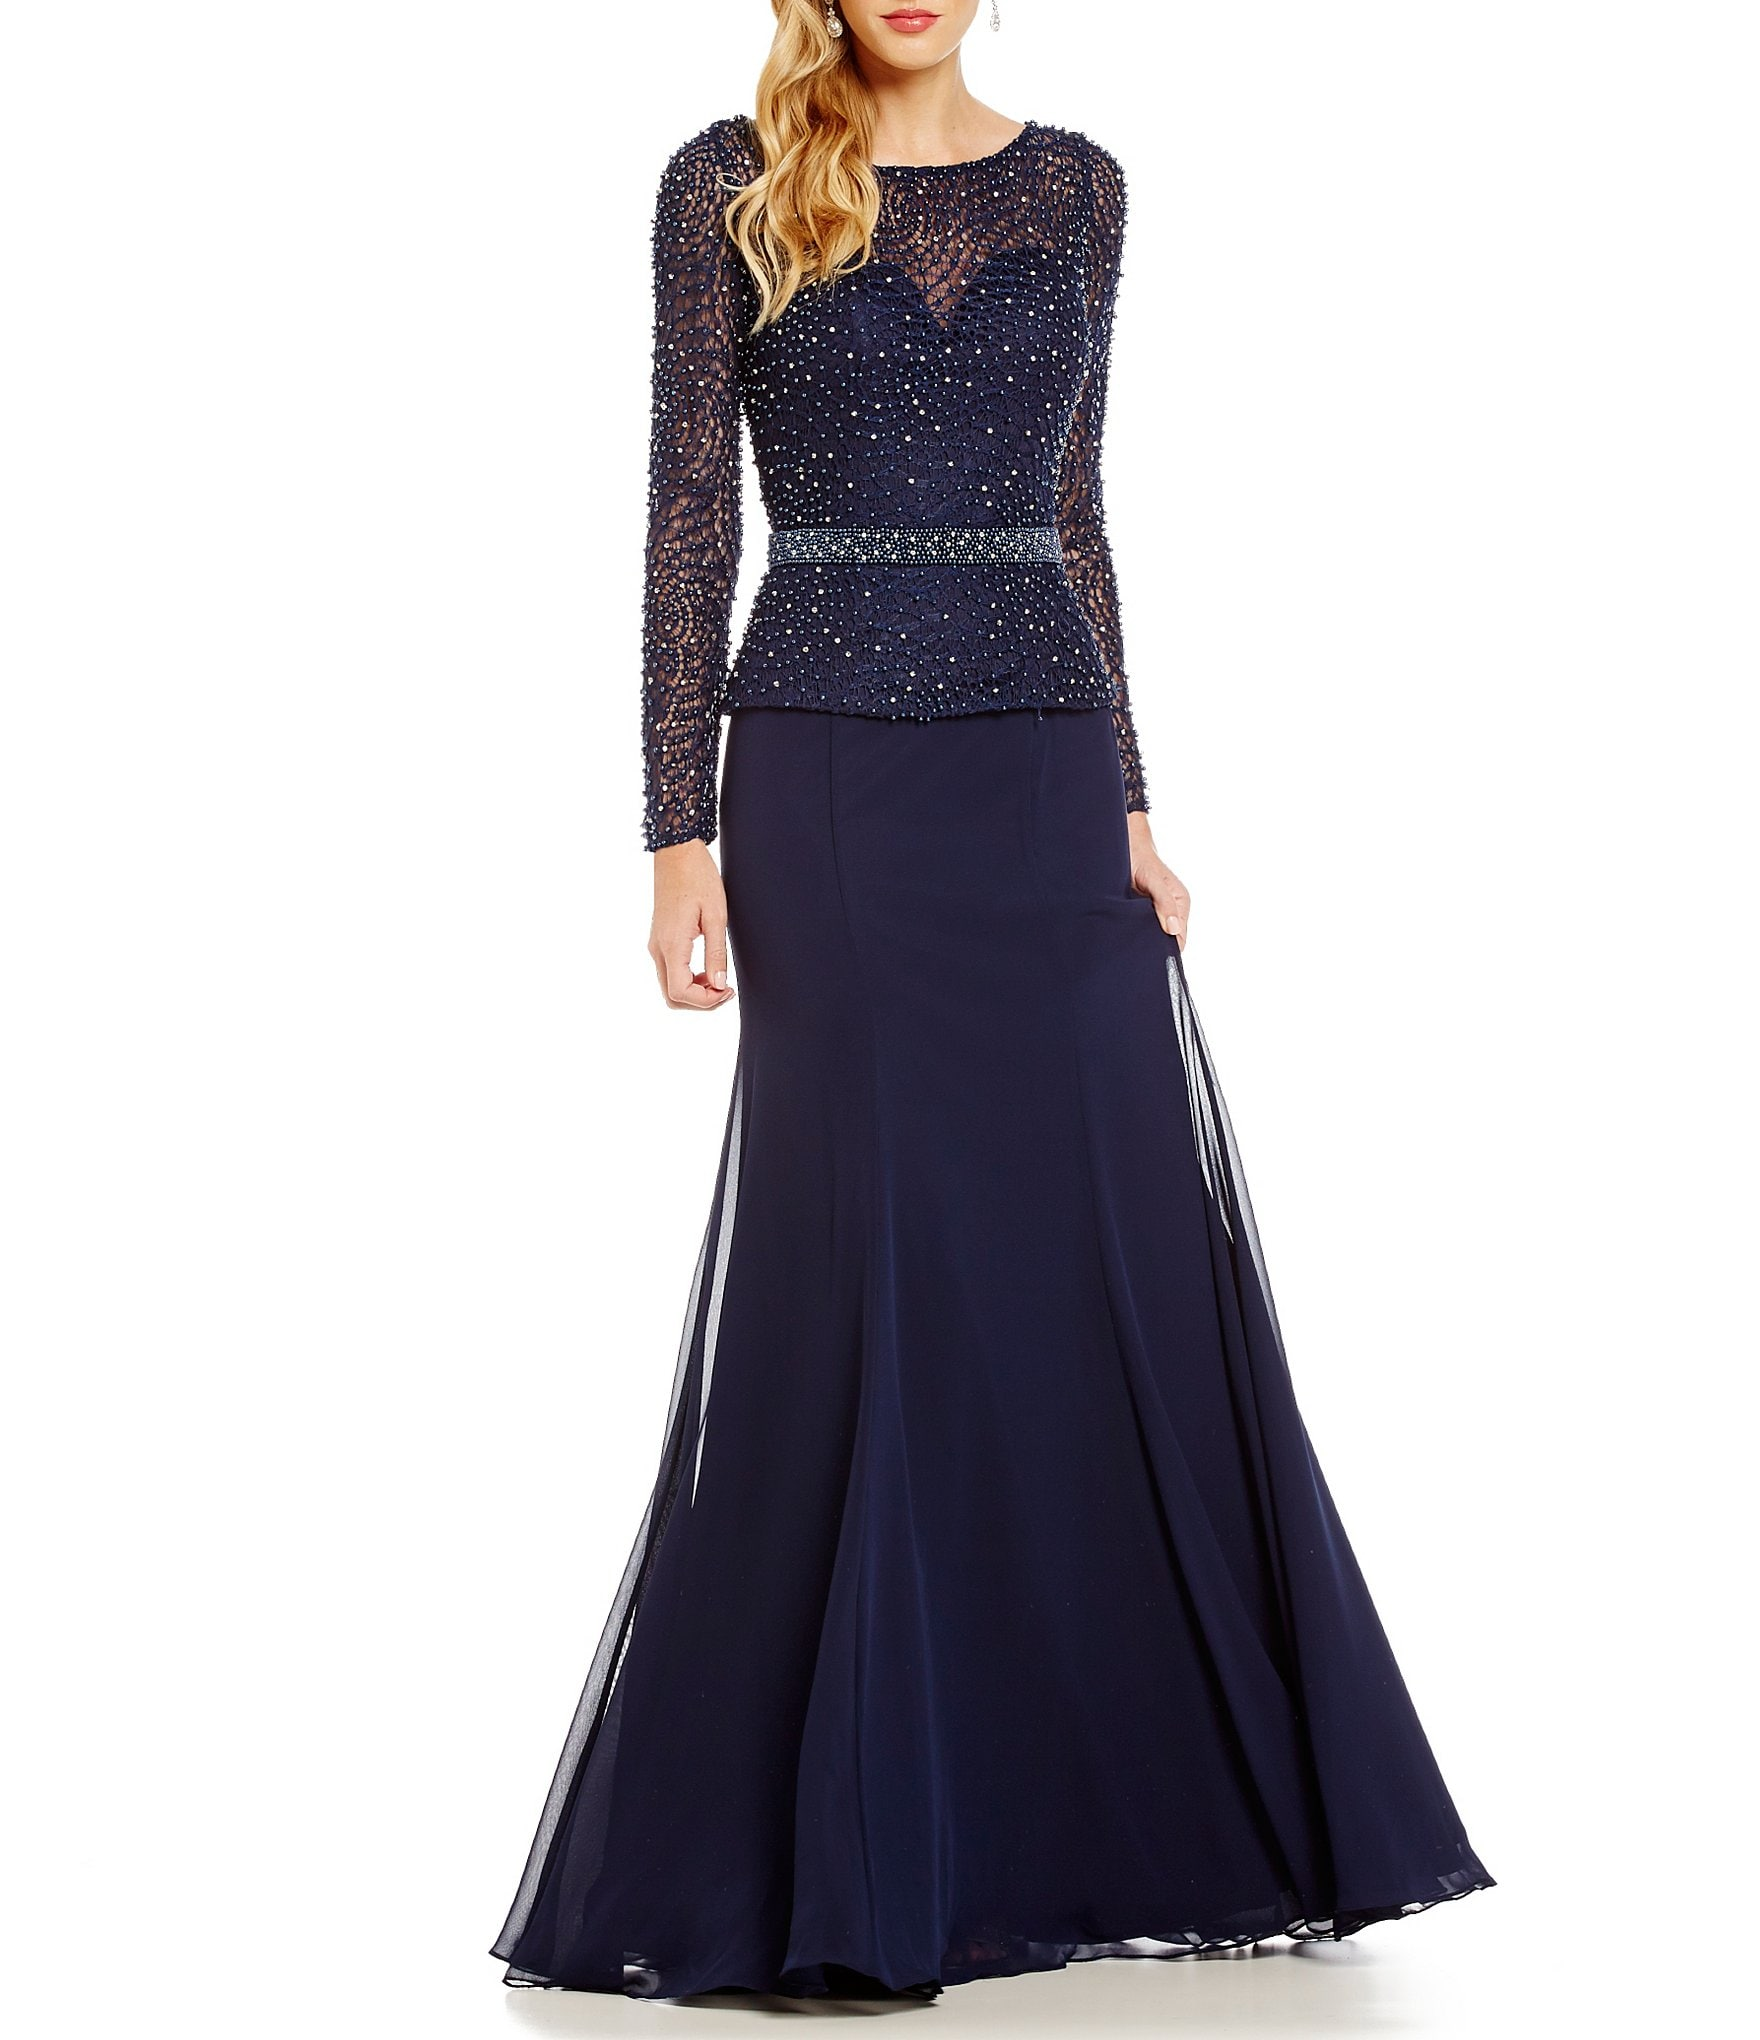 Women\'s Clothing | Dresses | Mother of the Bride | Dillards.com